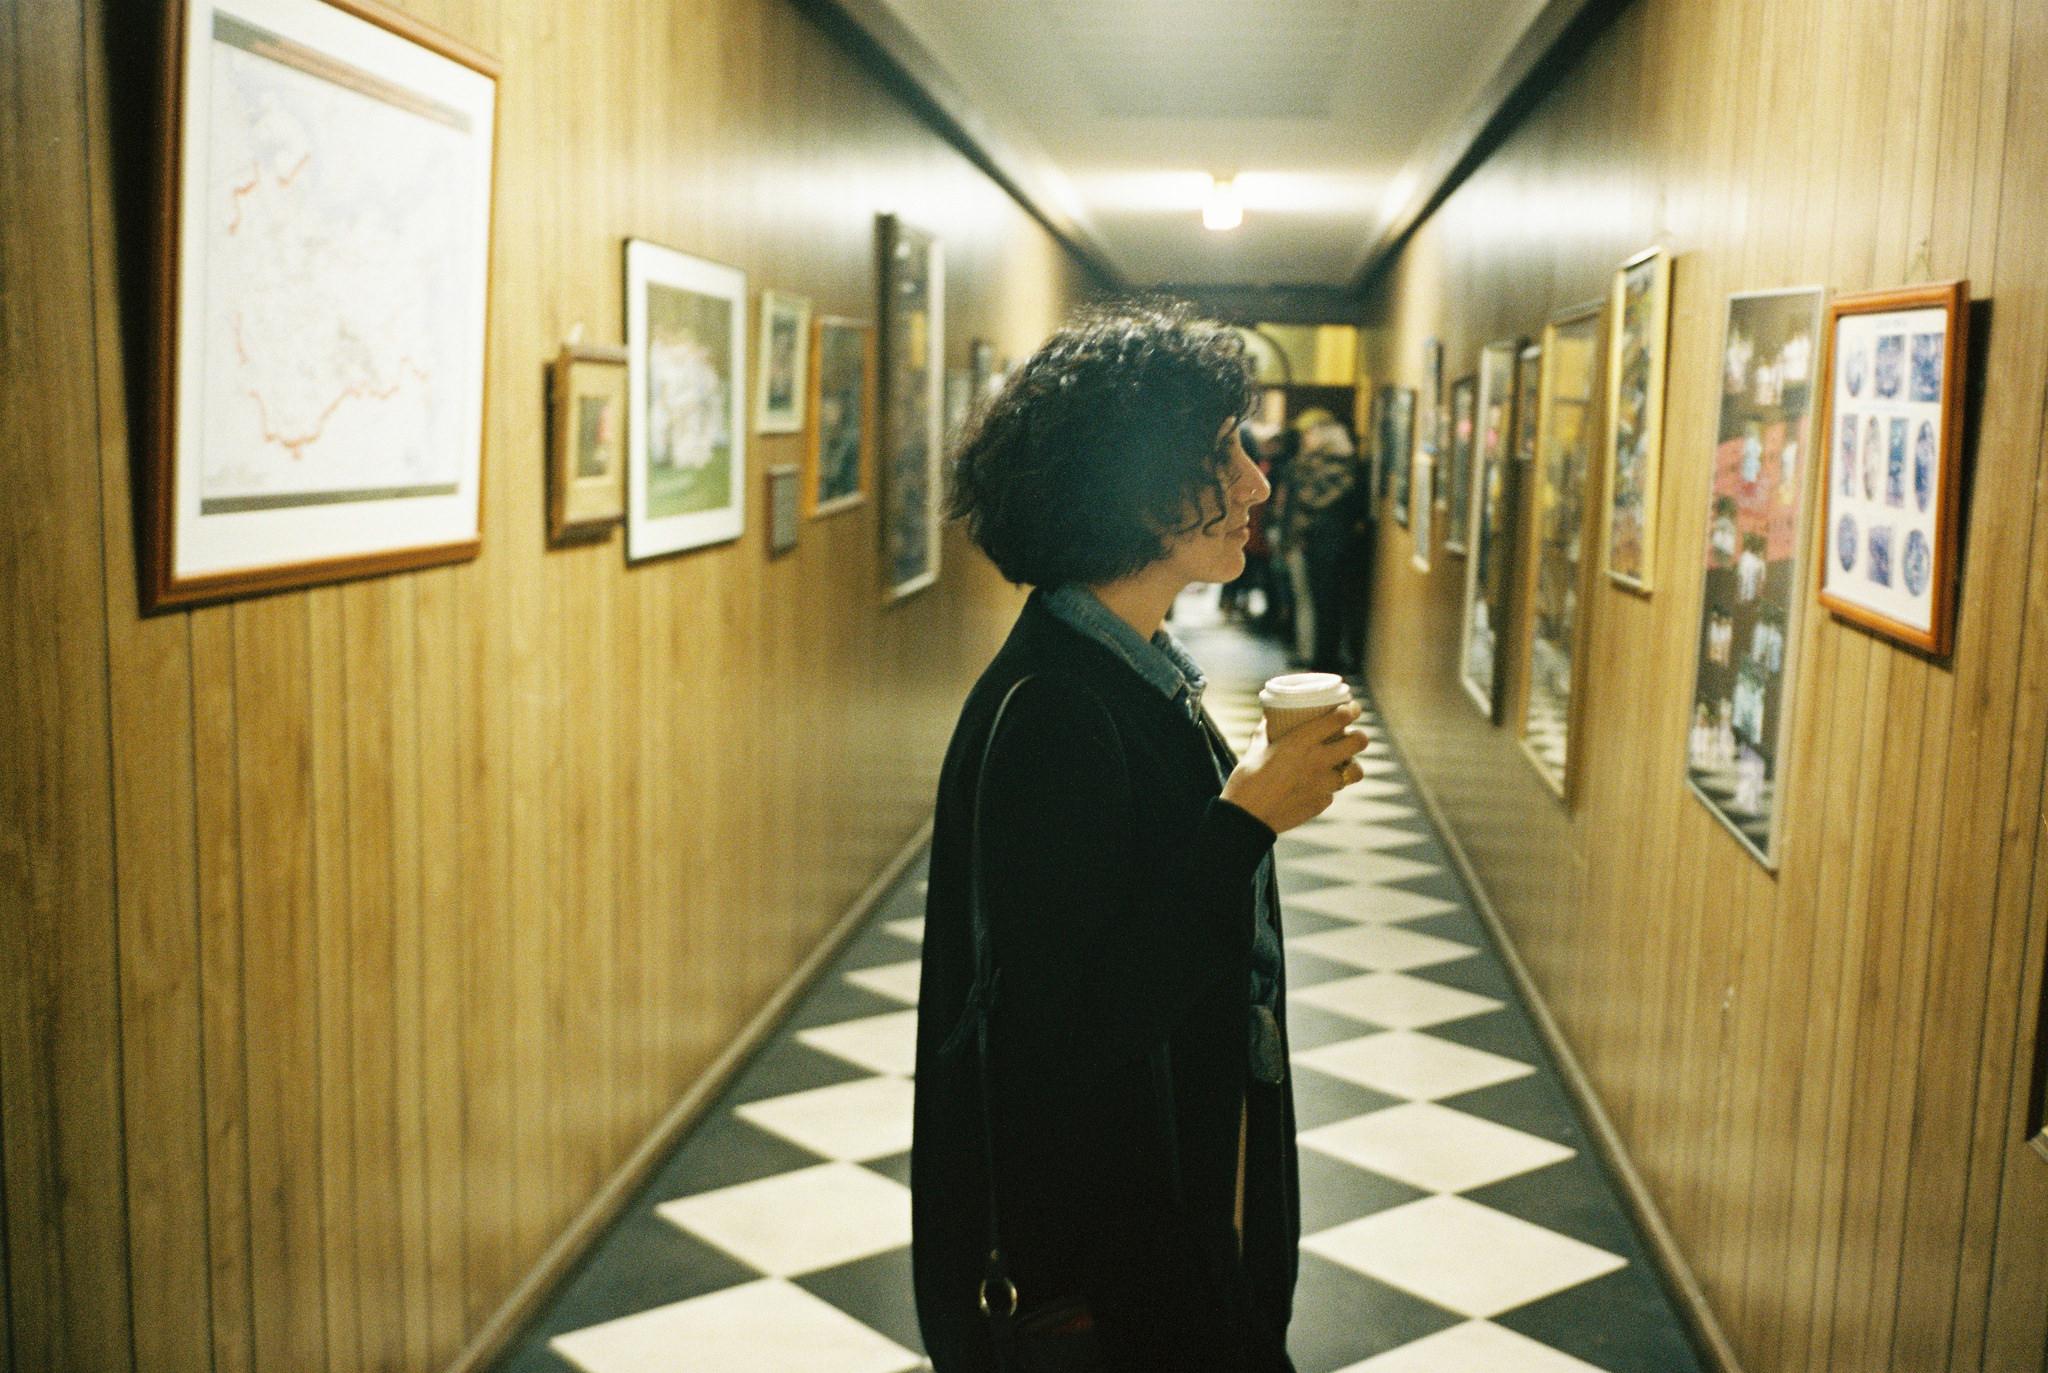 Hanging around hallways